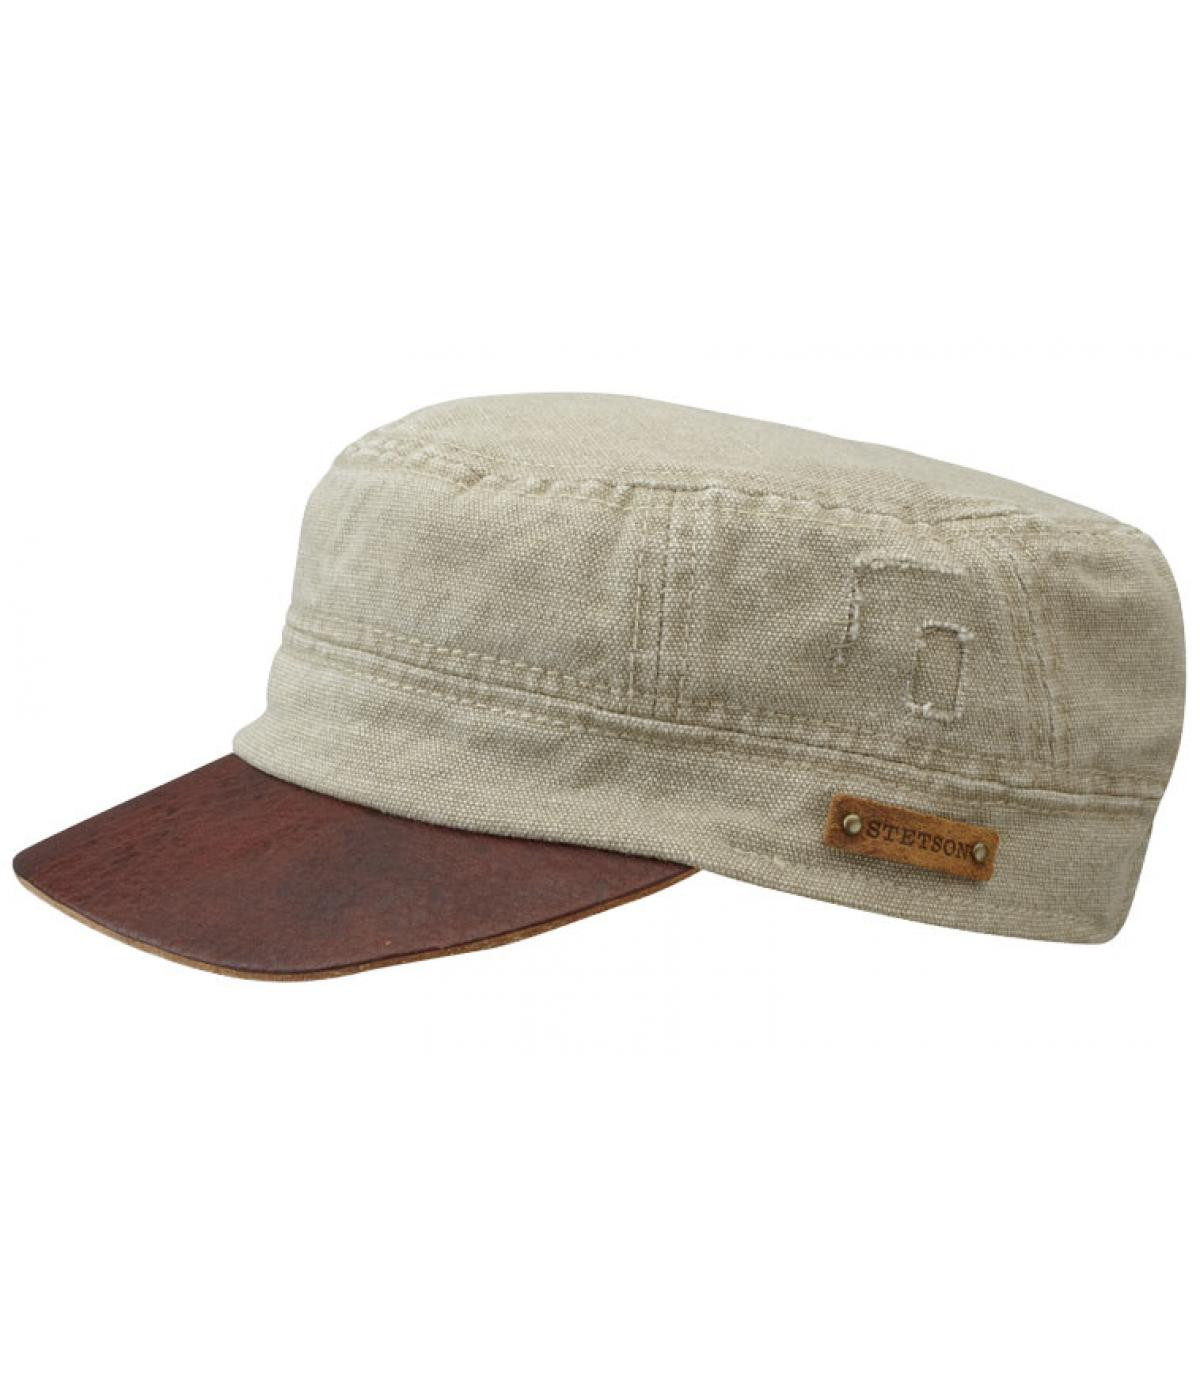 Army cap leather visor